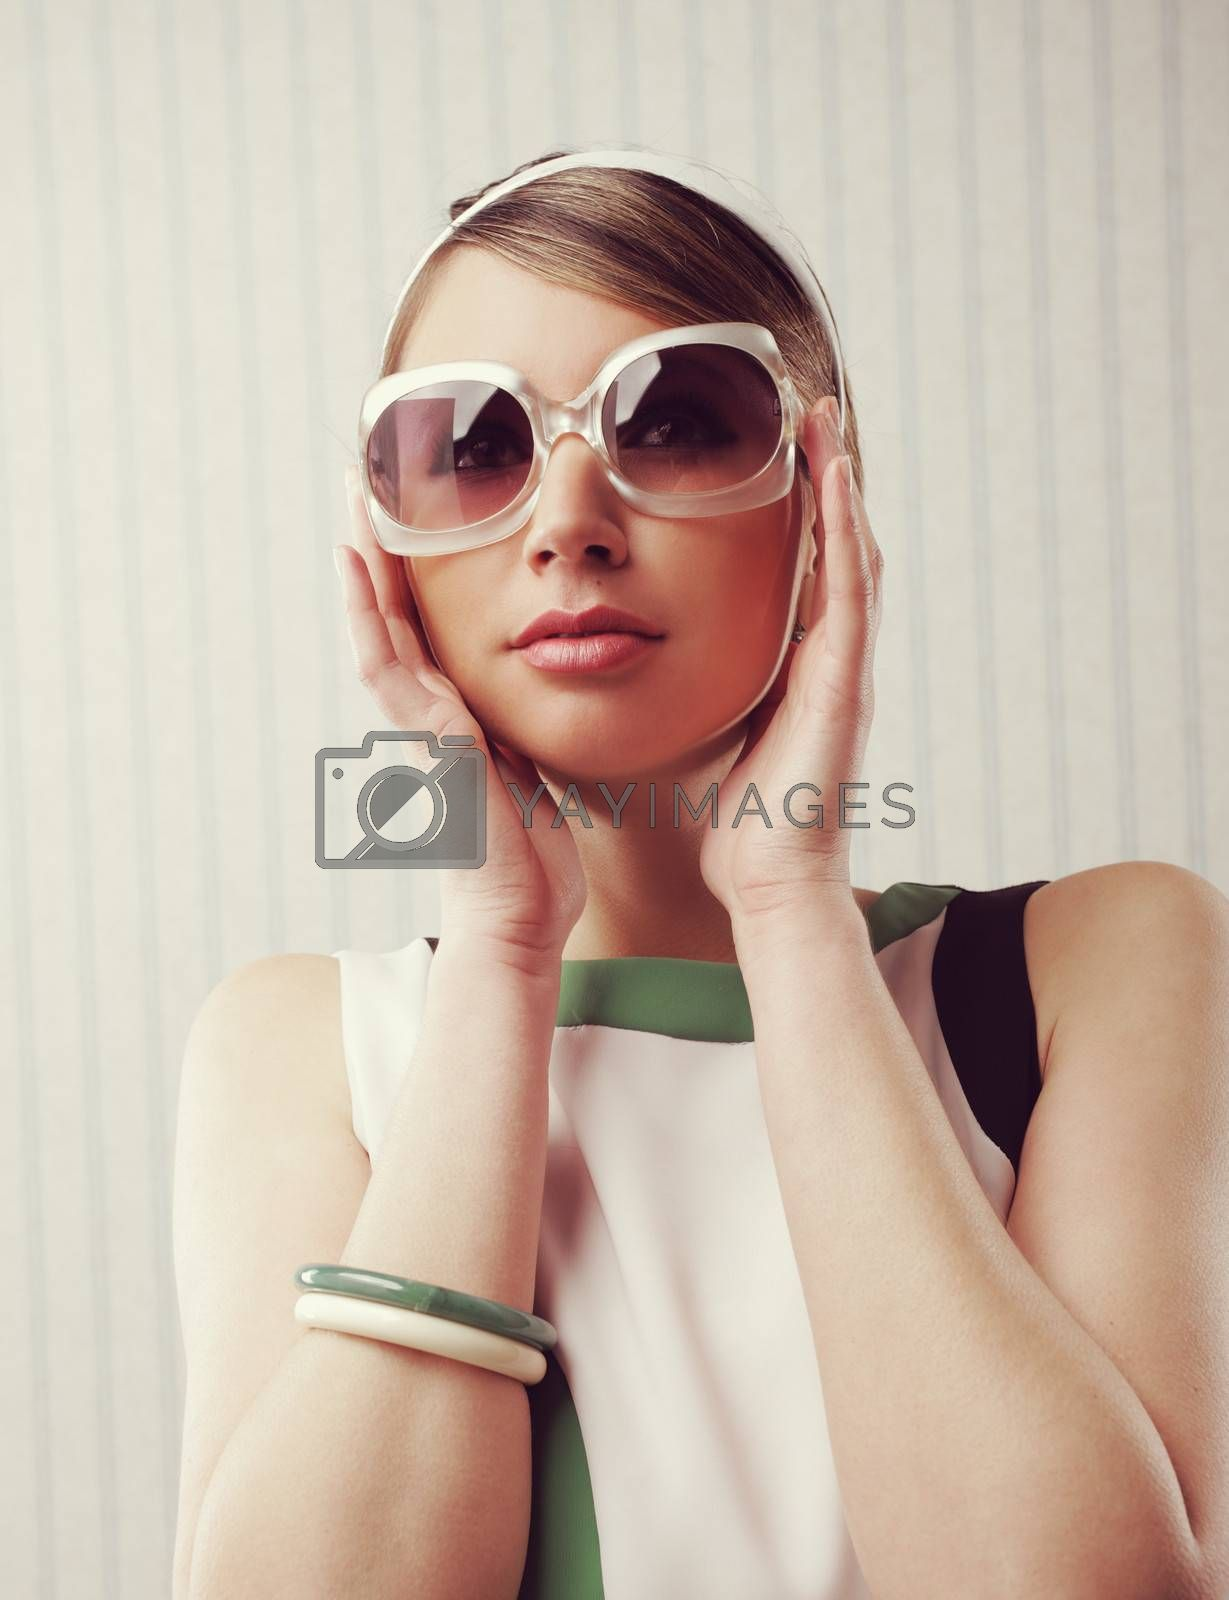 Vintage fashion by stokkete